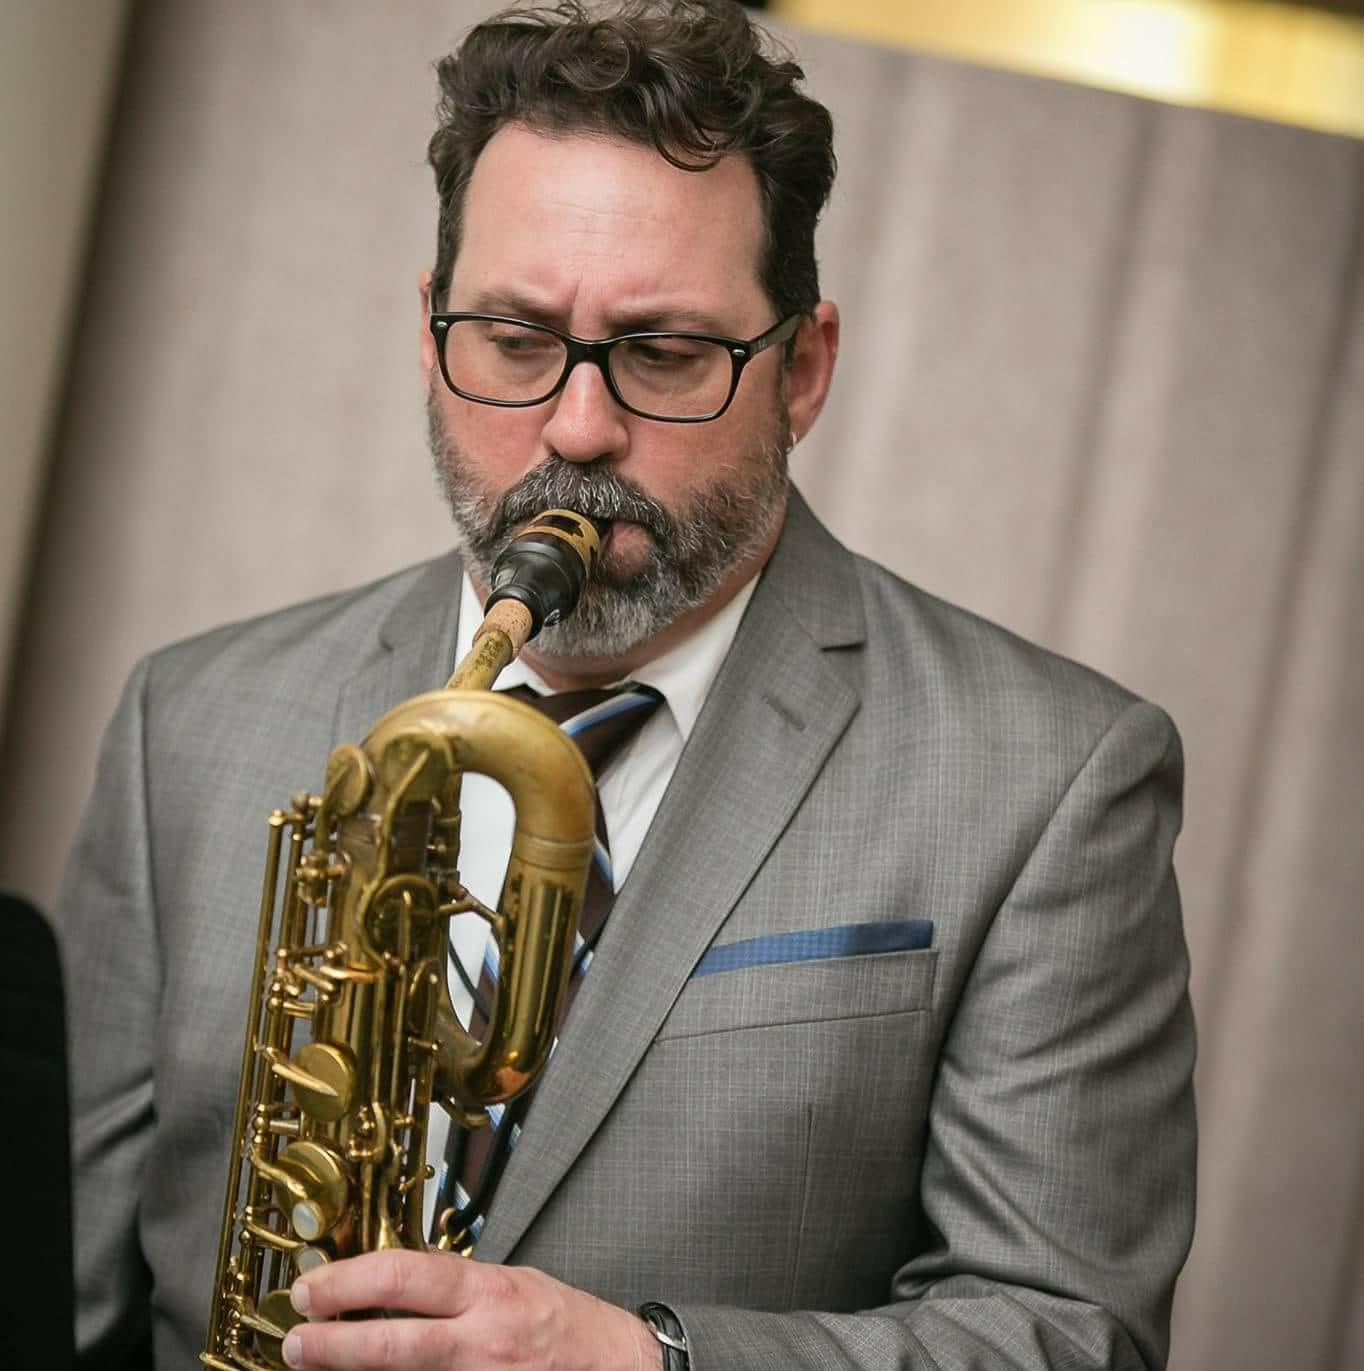 Dave Villa playing saxophone.